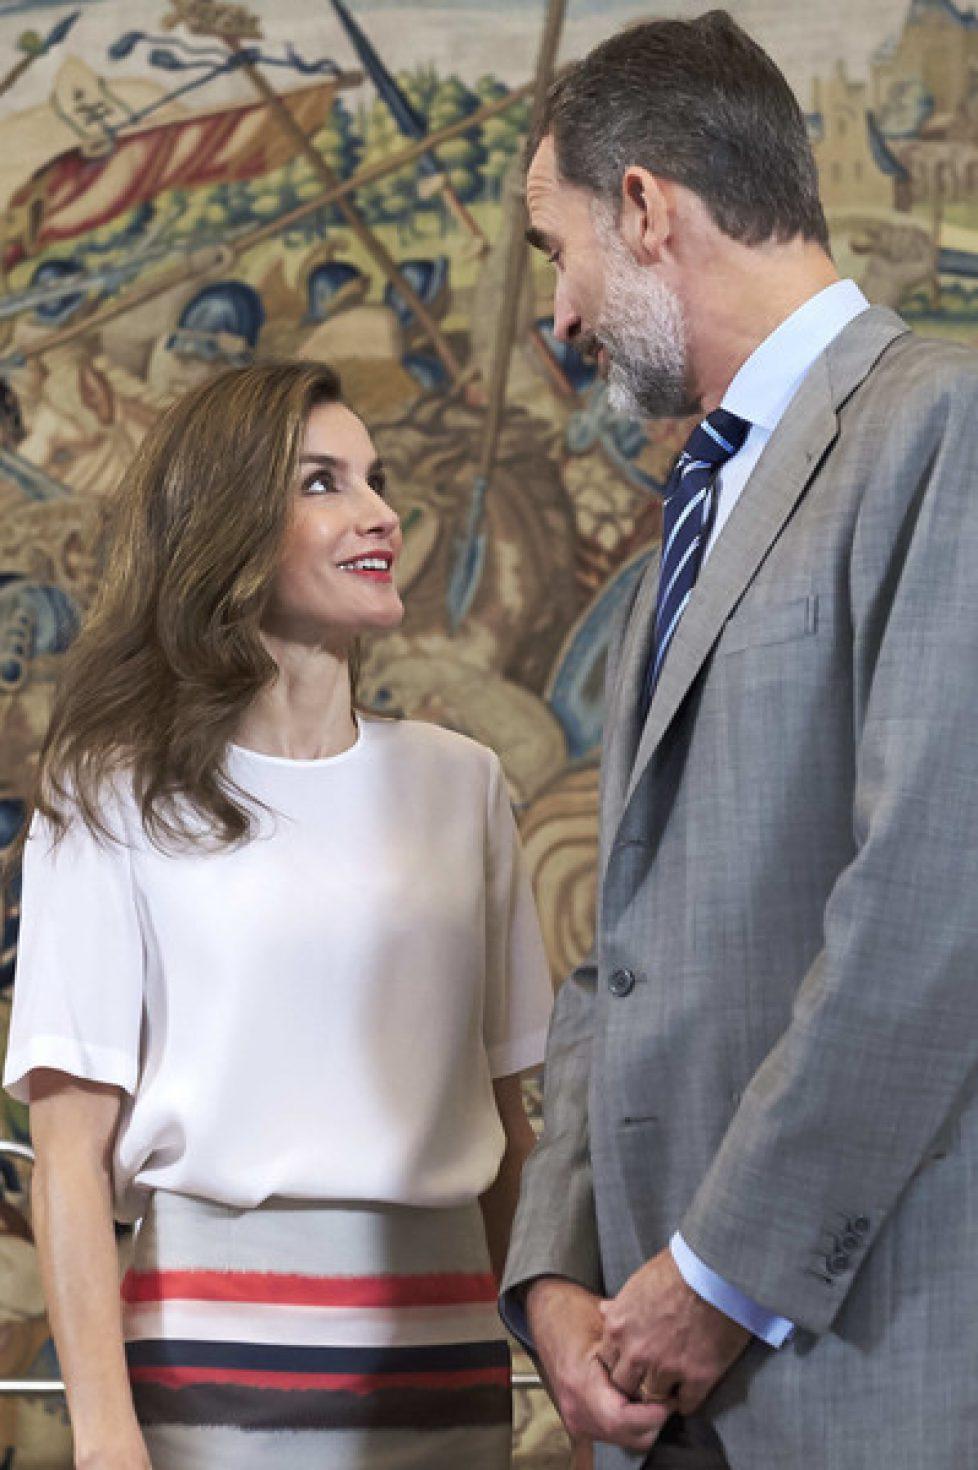 Spanish+Royals+Attend+Audiences+Zarzuela+Palace+r9DWswUyFSbl